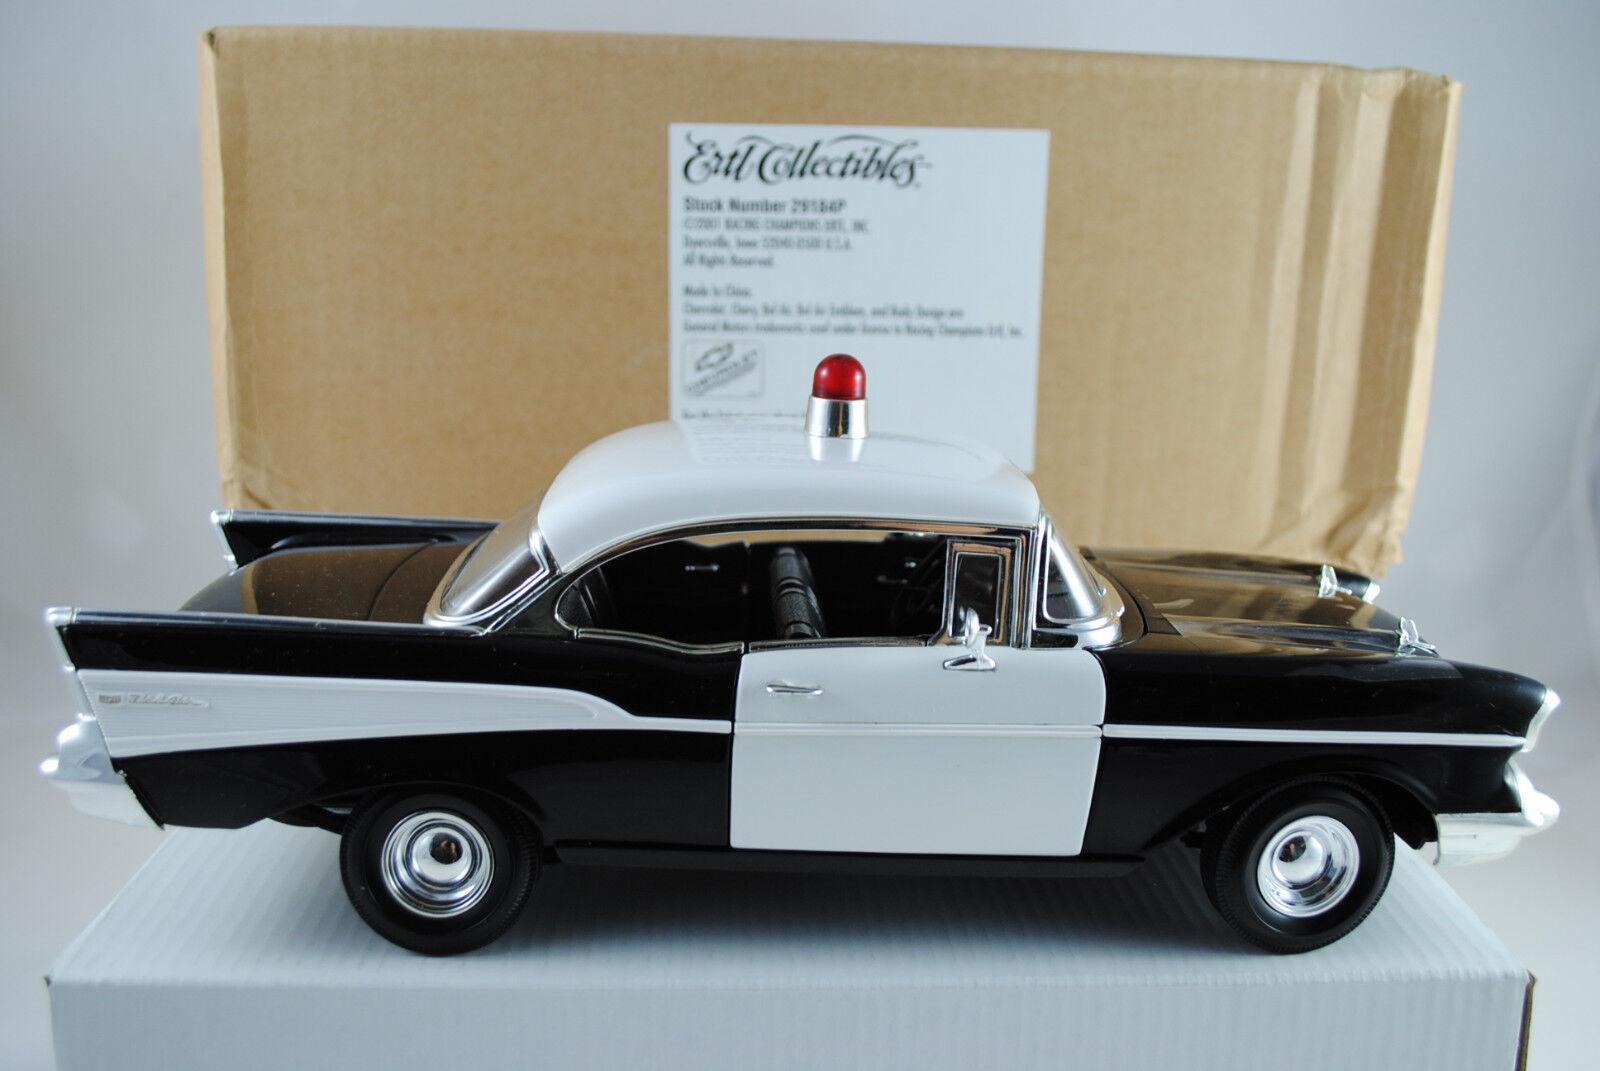 1 18 - ERTL 1957 CHEVY BEL AIR HARD TOP POLICE CAR Rarità Nuovo Scatola Originale  29184 P